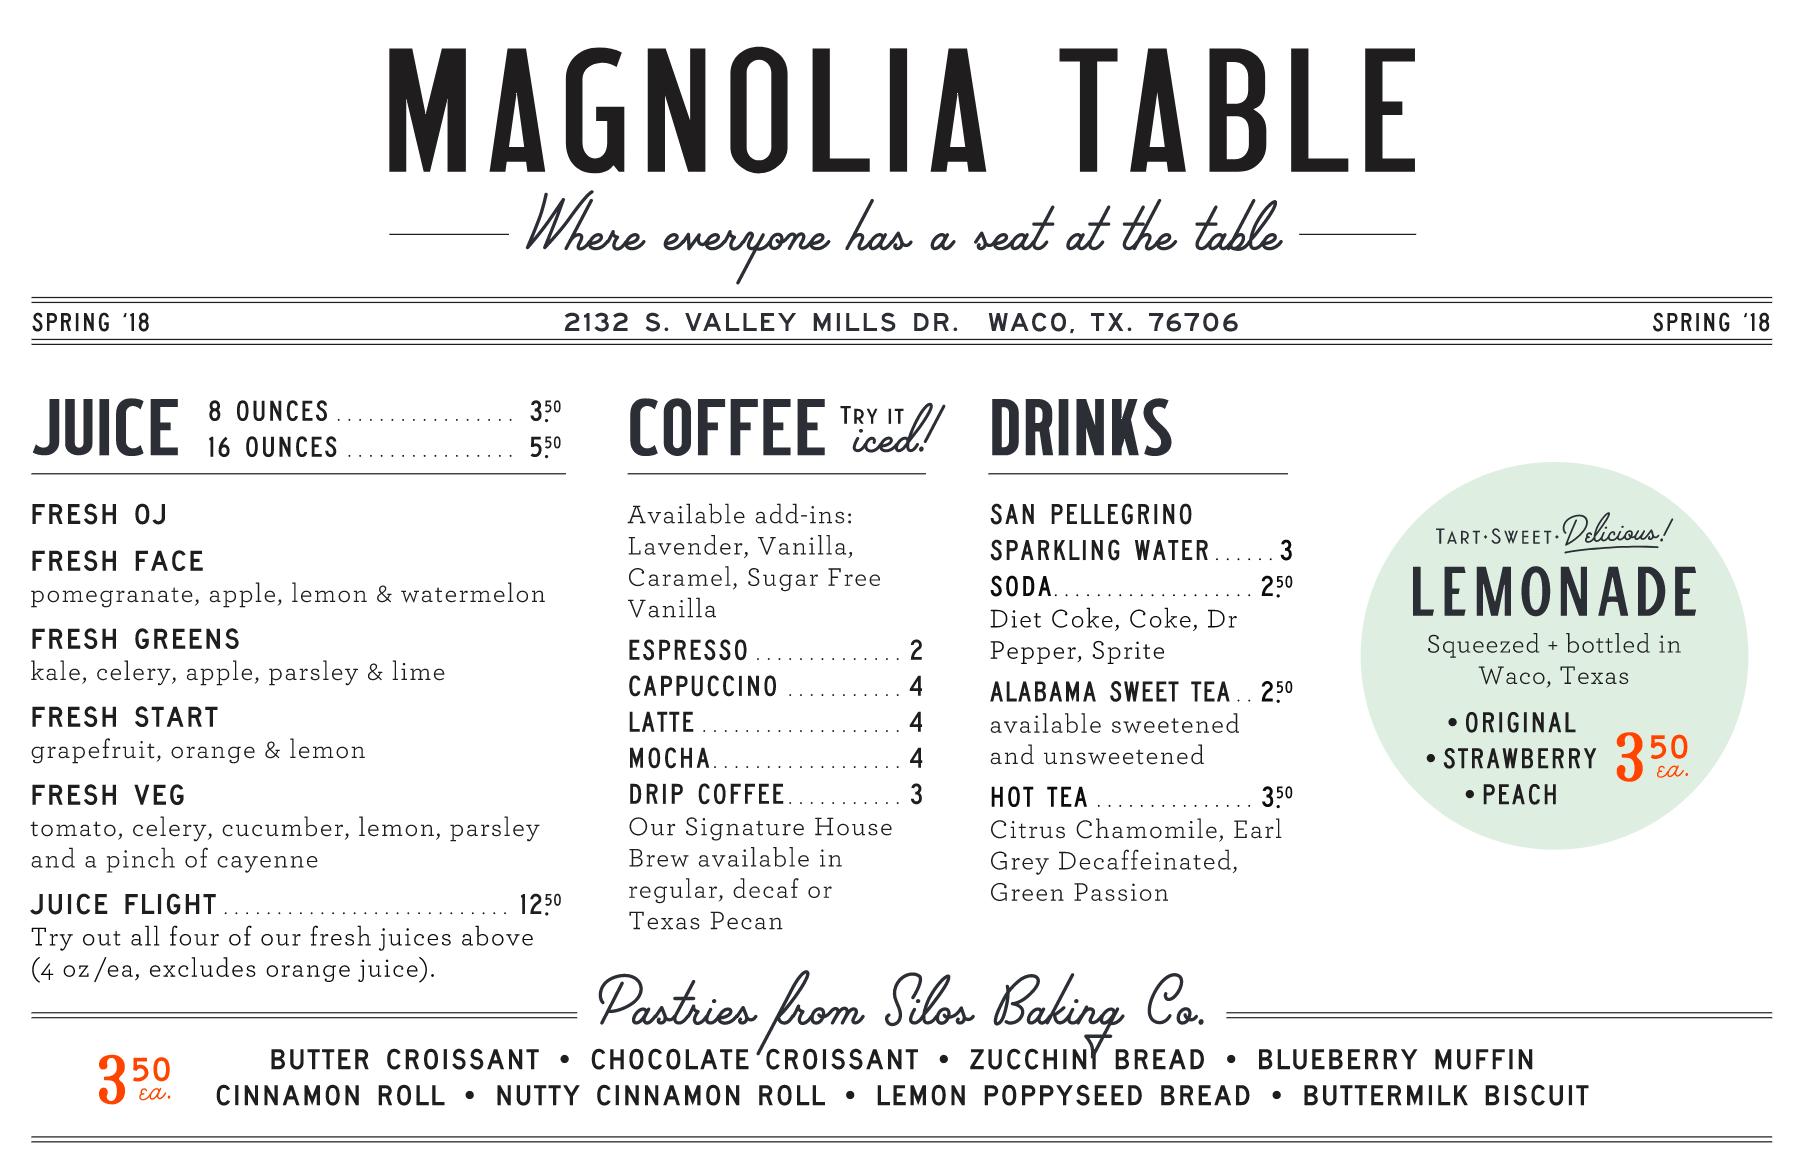 Magnolia Table menu